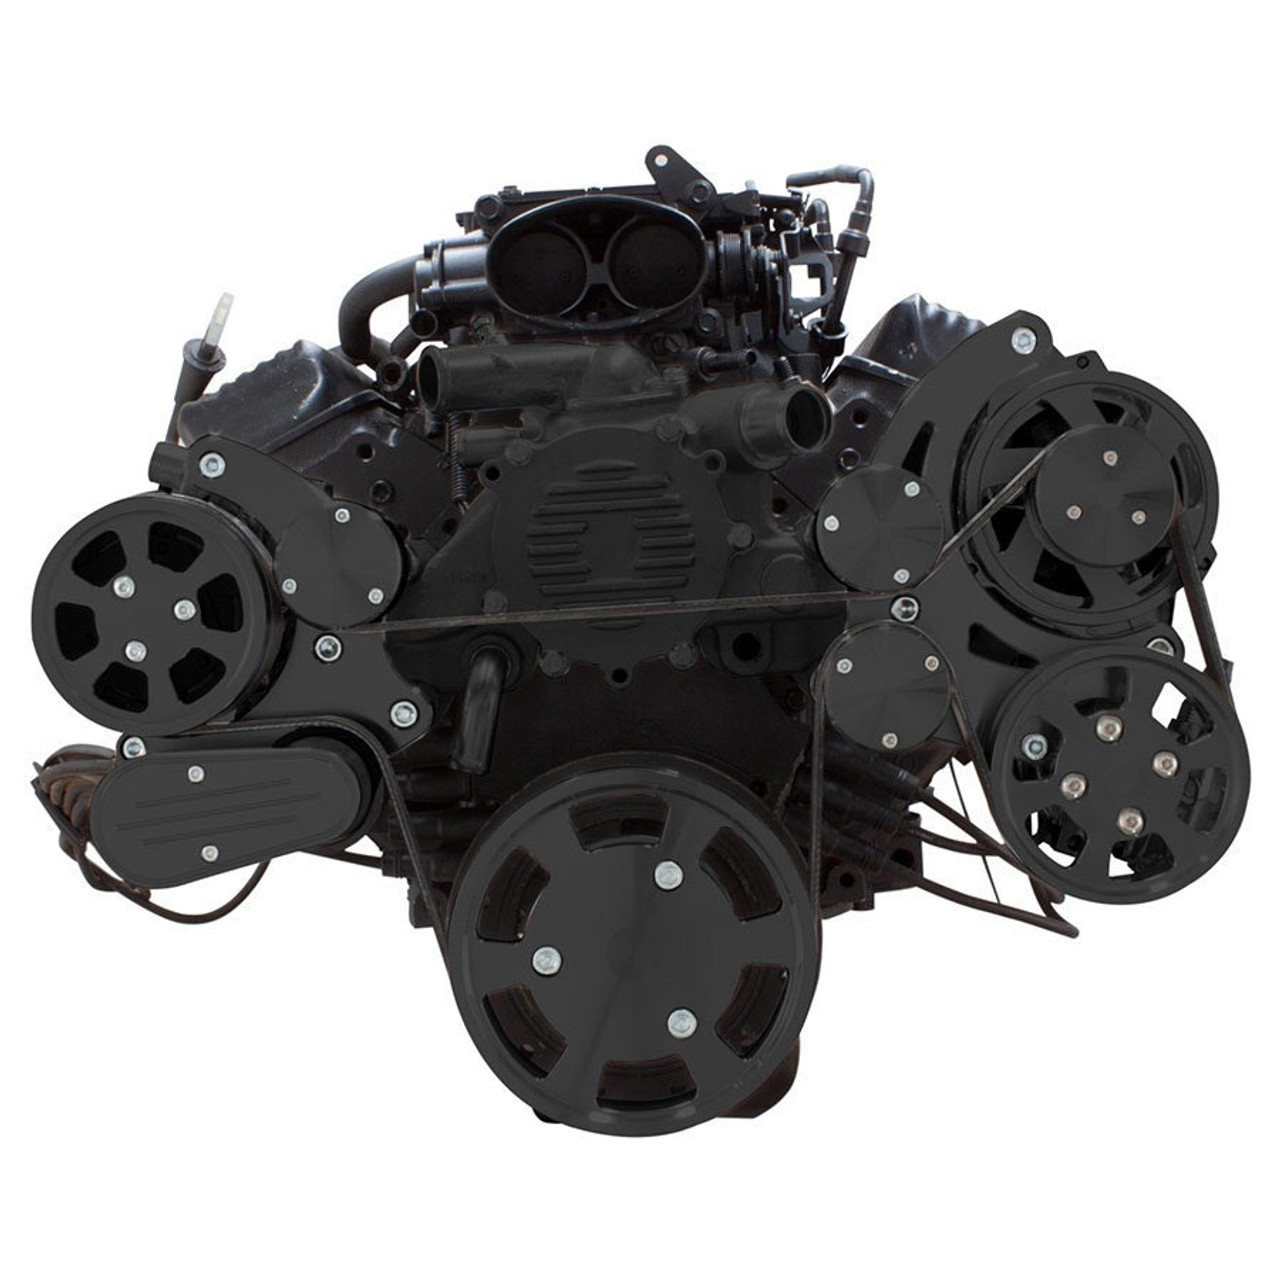 stealth black serpentine system for lt1 generation ii ac, power steering \u0026 alternator all inclusive Brackets Flower Diagram